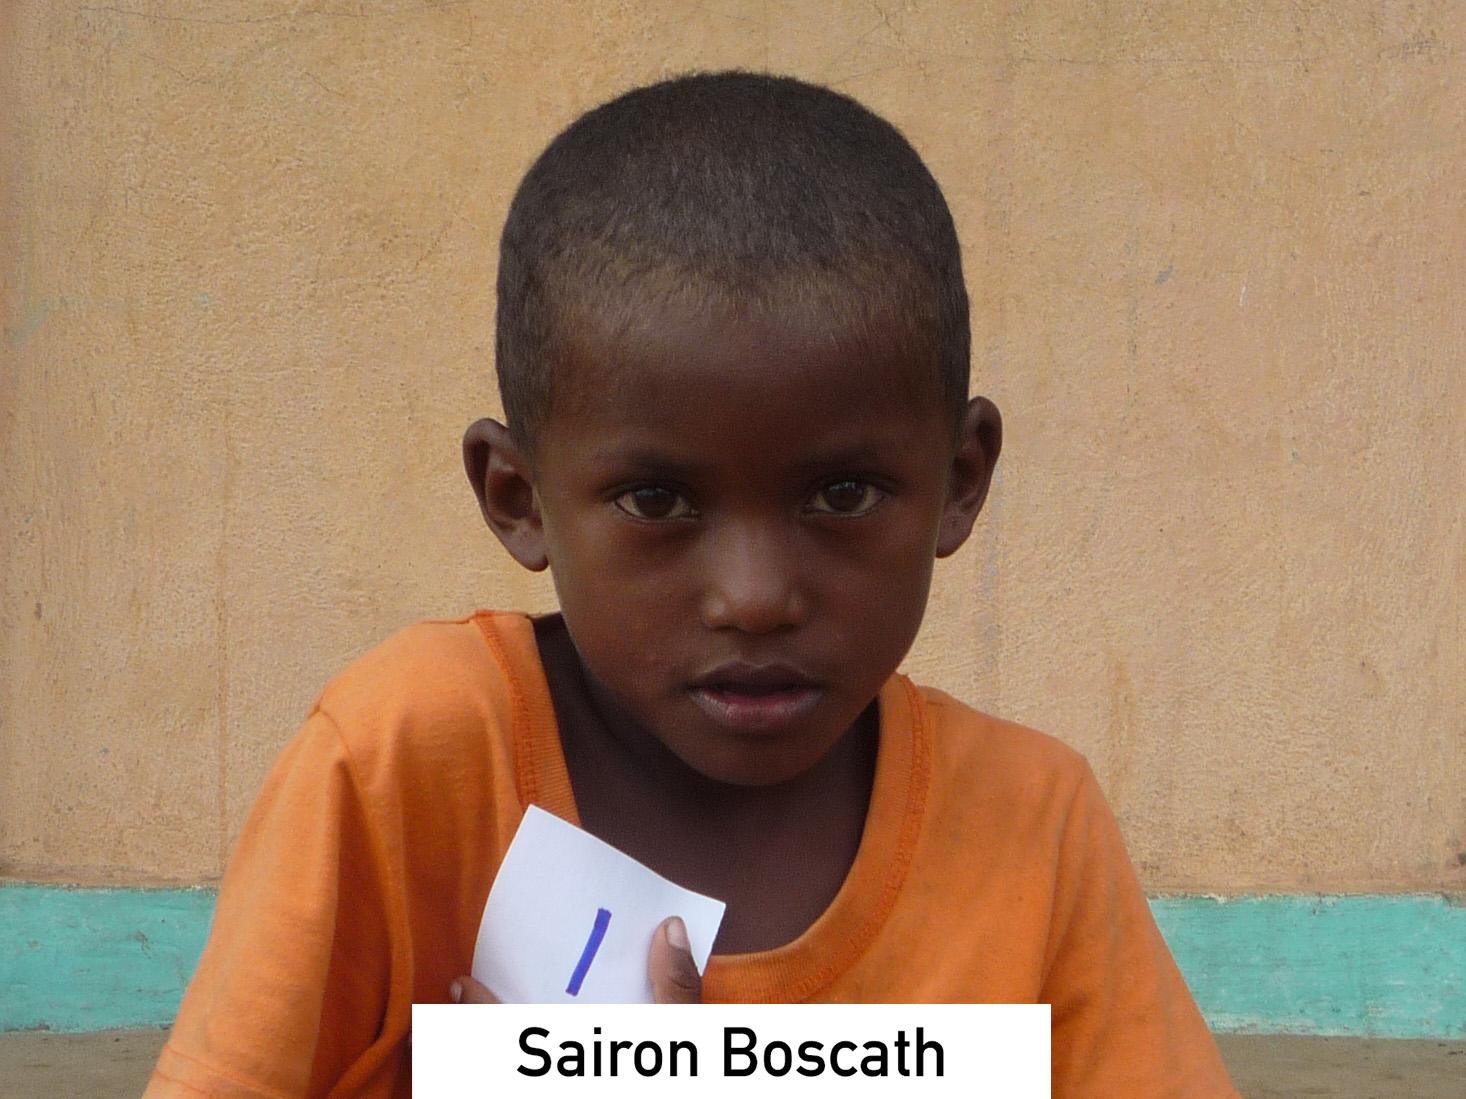 001 - Sairon Boscath.jpg